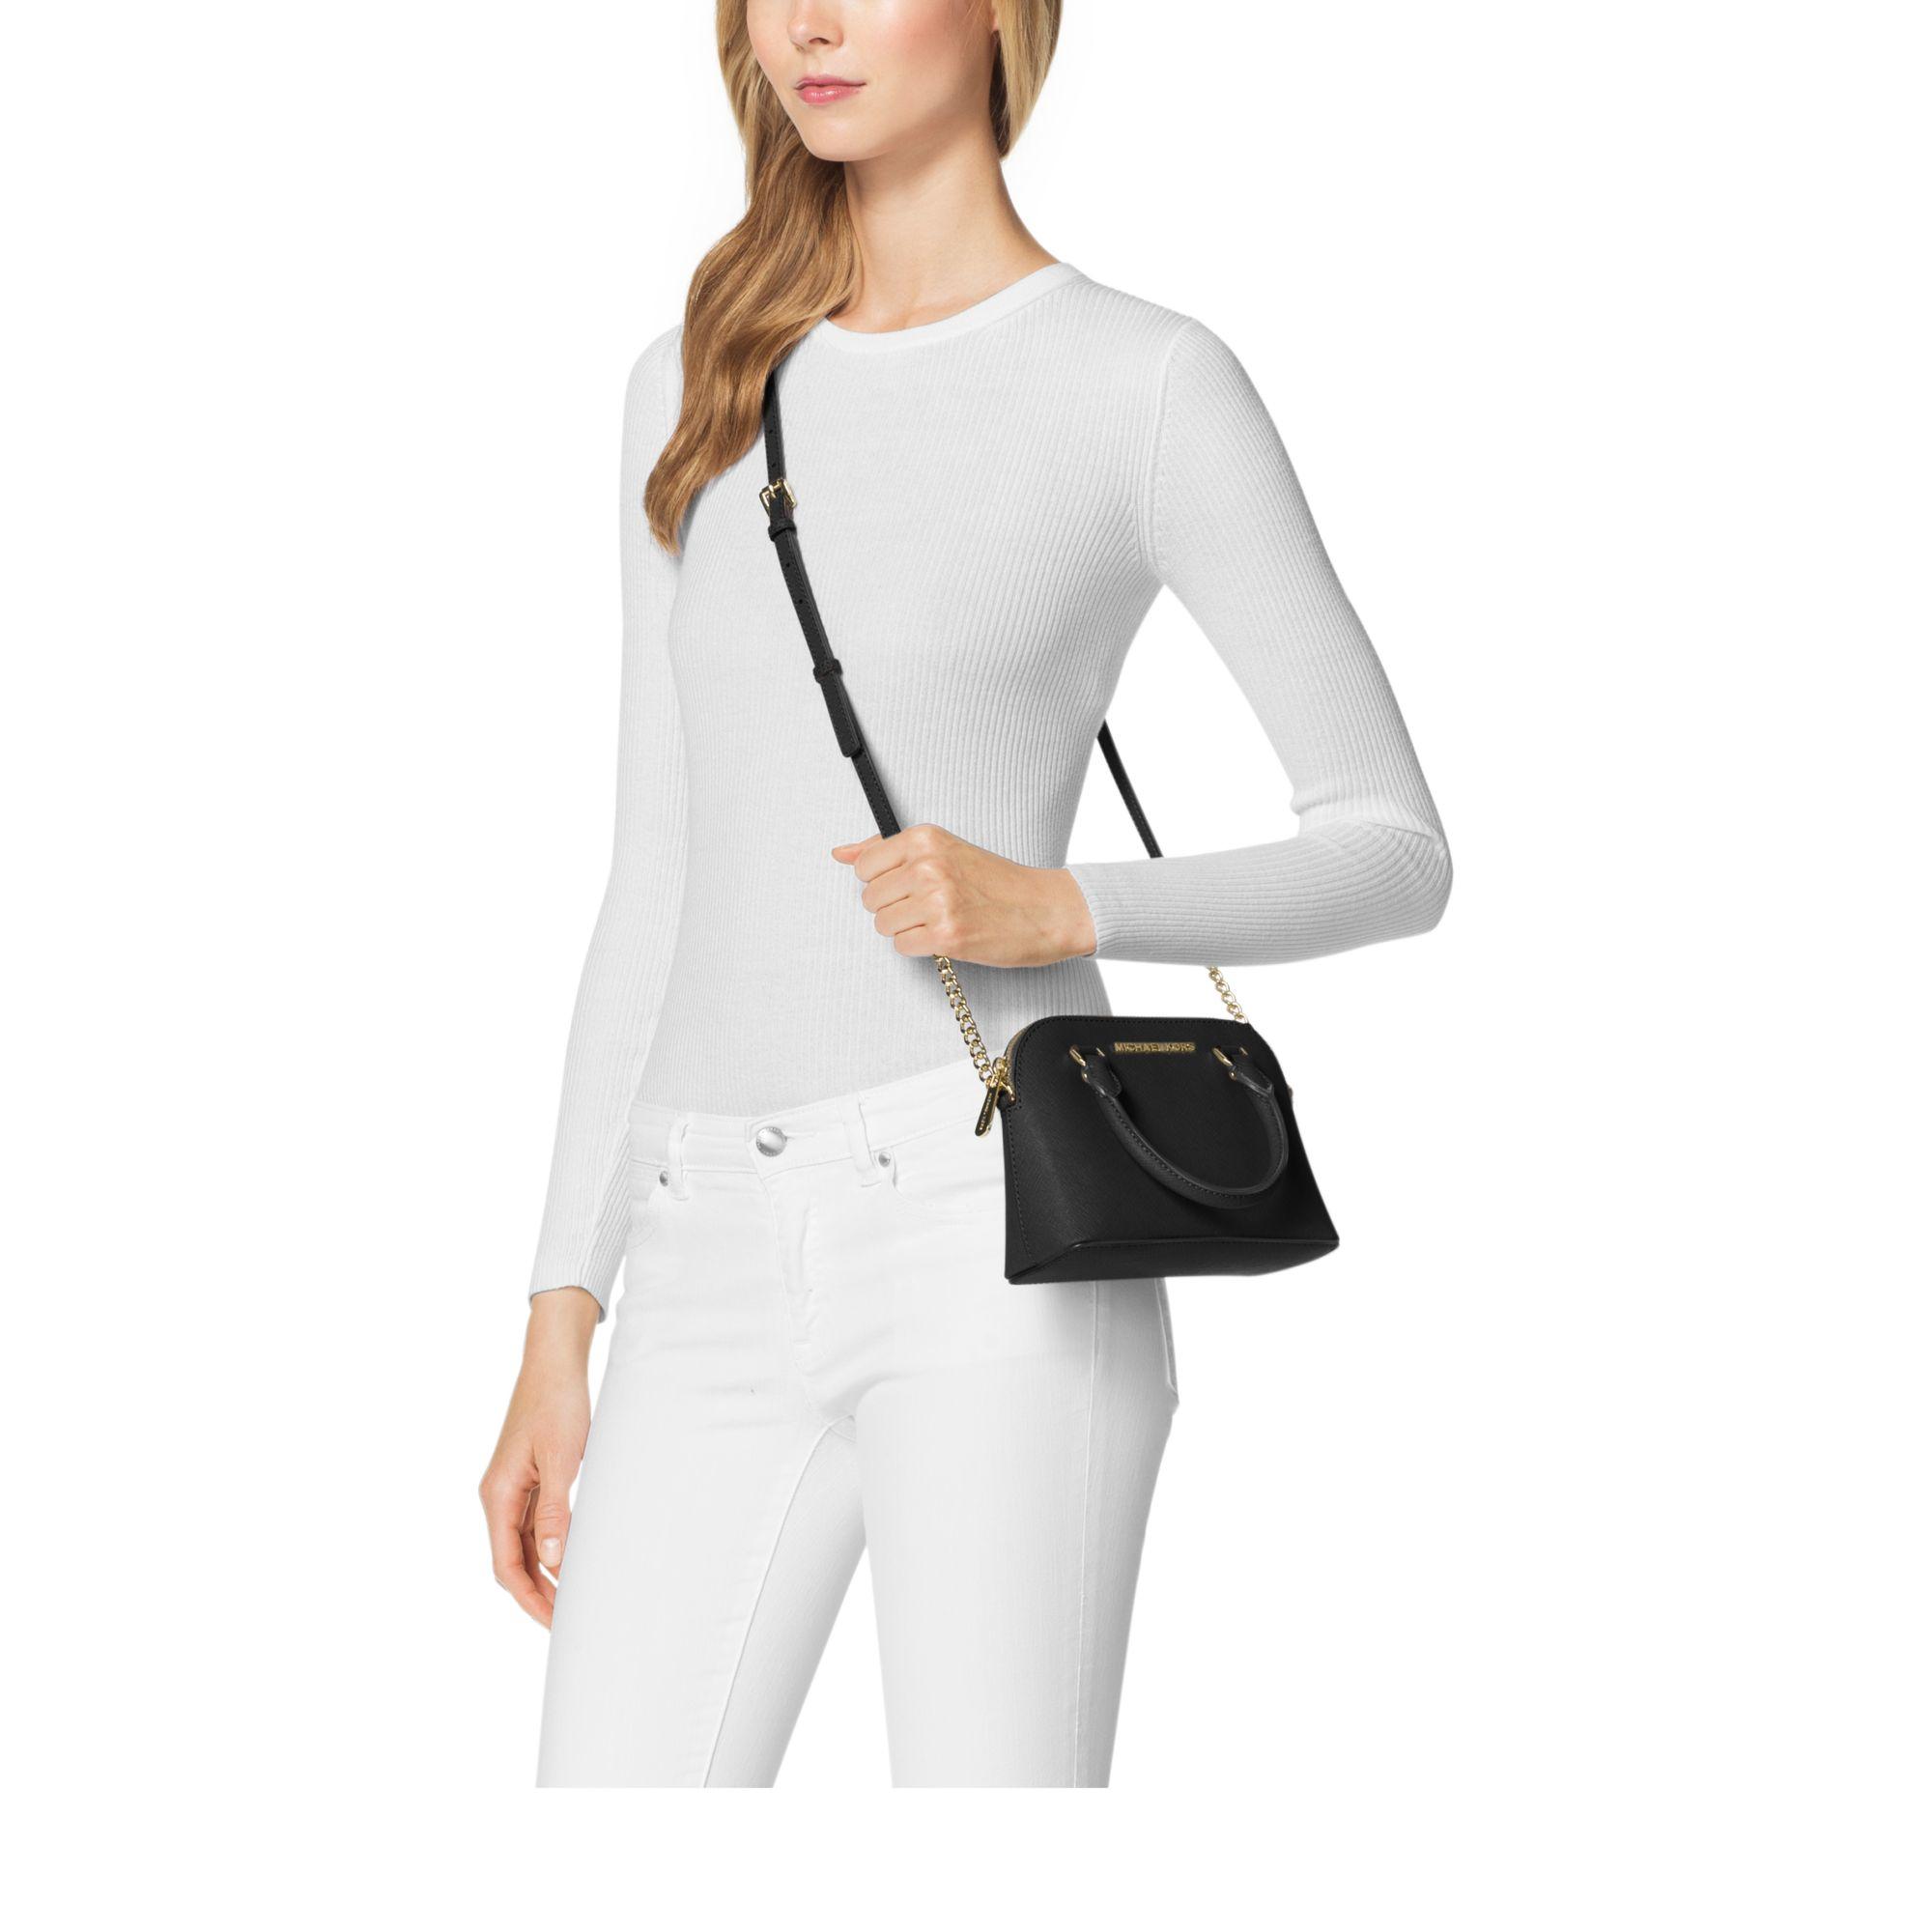 42b28ff7771e2e Michael Kors Cindy Extra-small Saffiano Leather Crossbody in Black ...